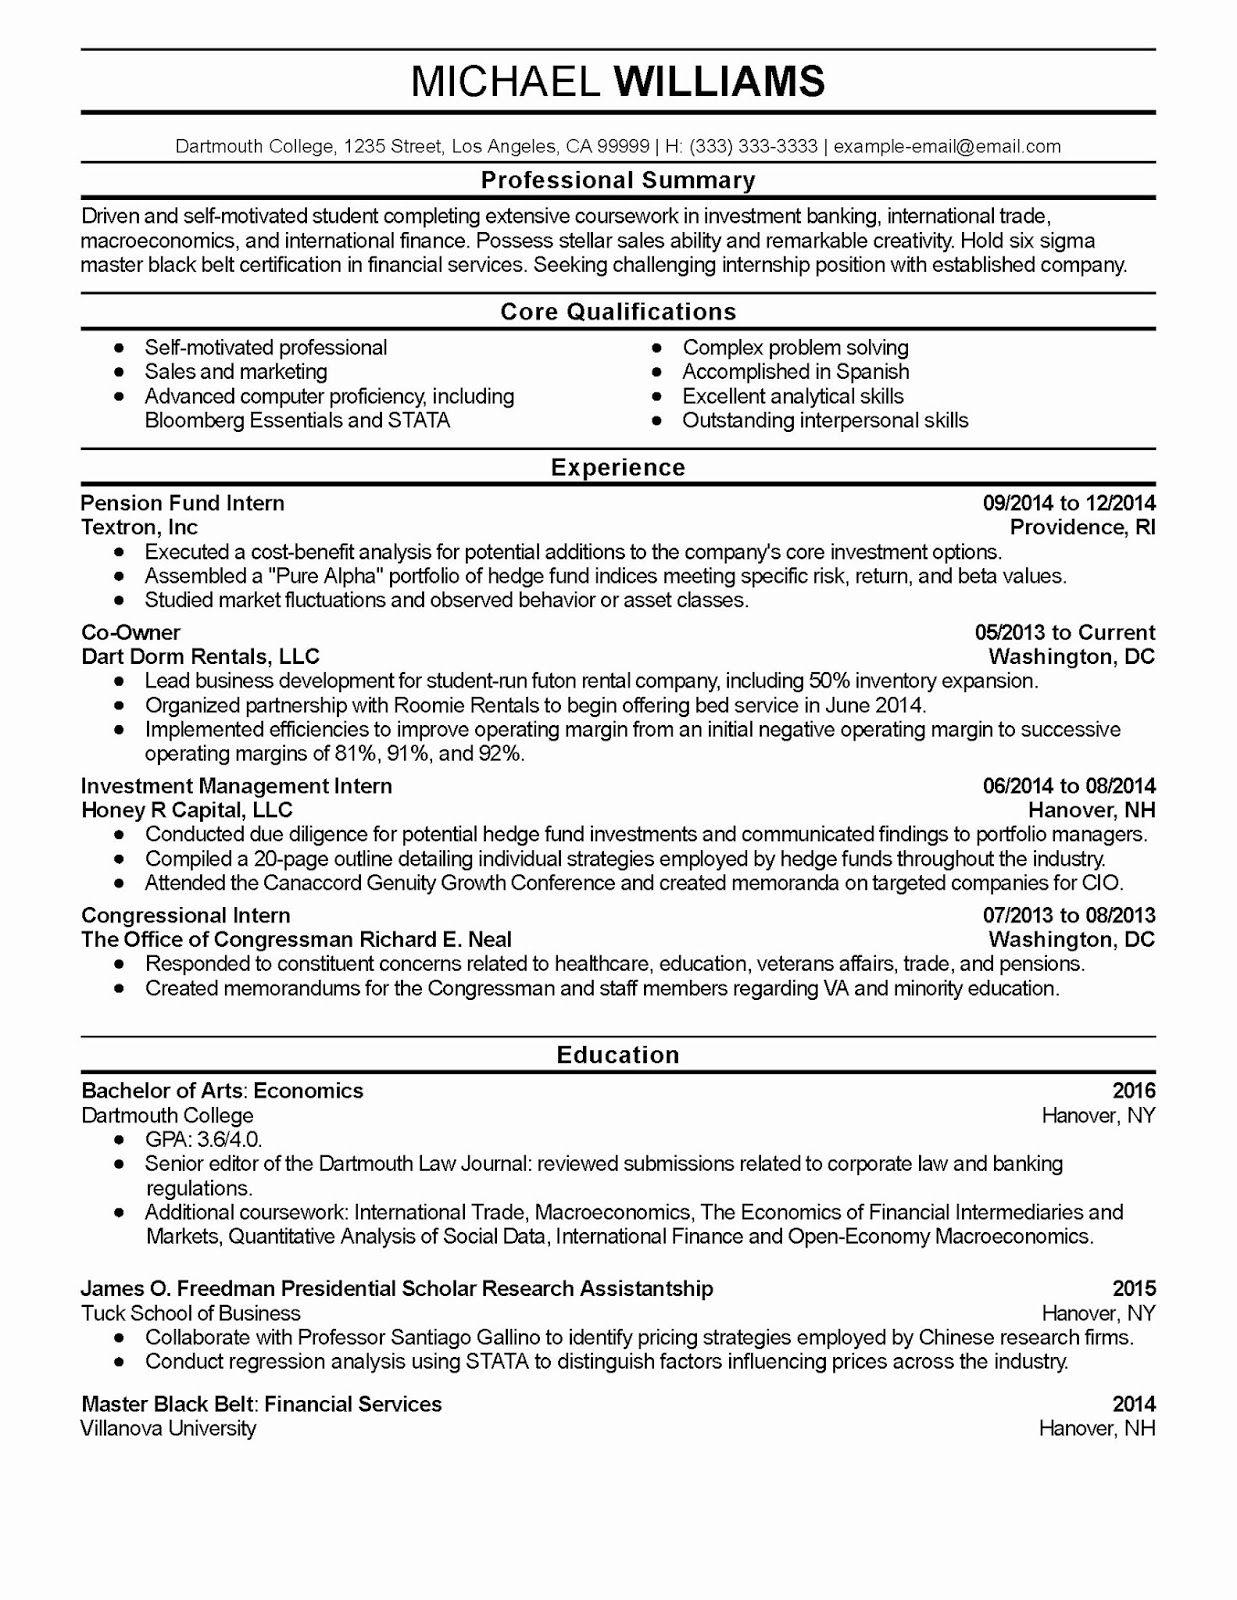 Data Analyst Resume Examples 2019 Data Analyst Resume Sample 2020 Data Analyst Resume Sample Data Analyst Business Analyst Resume Resume Examples Resume Skills